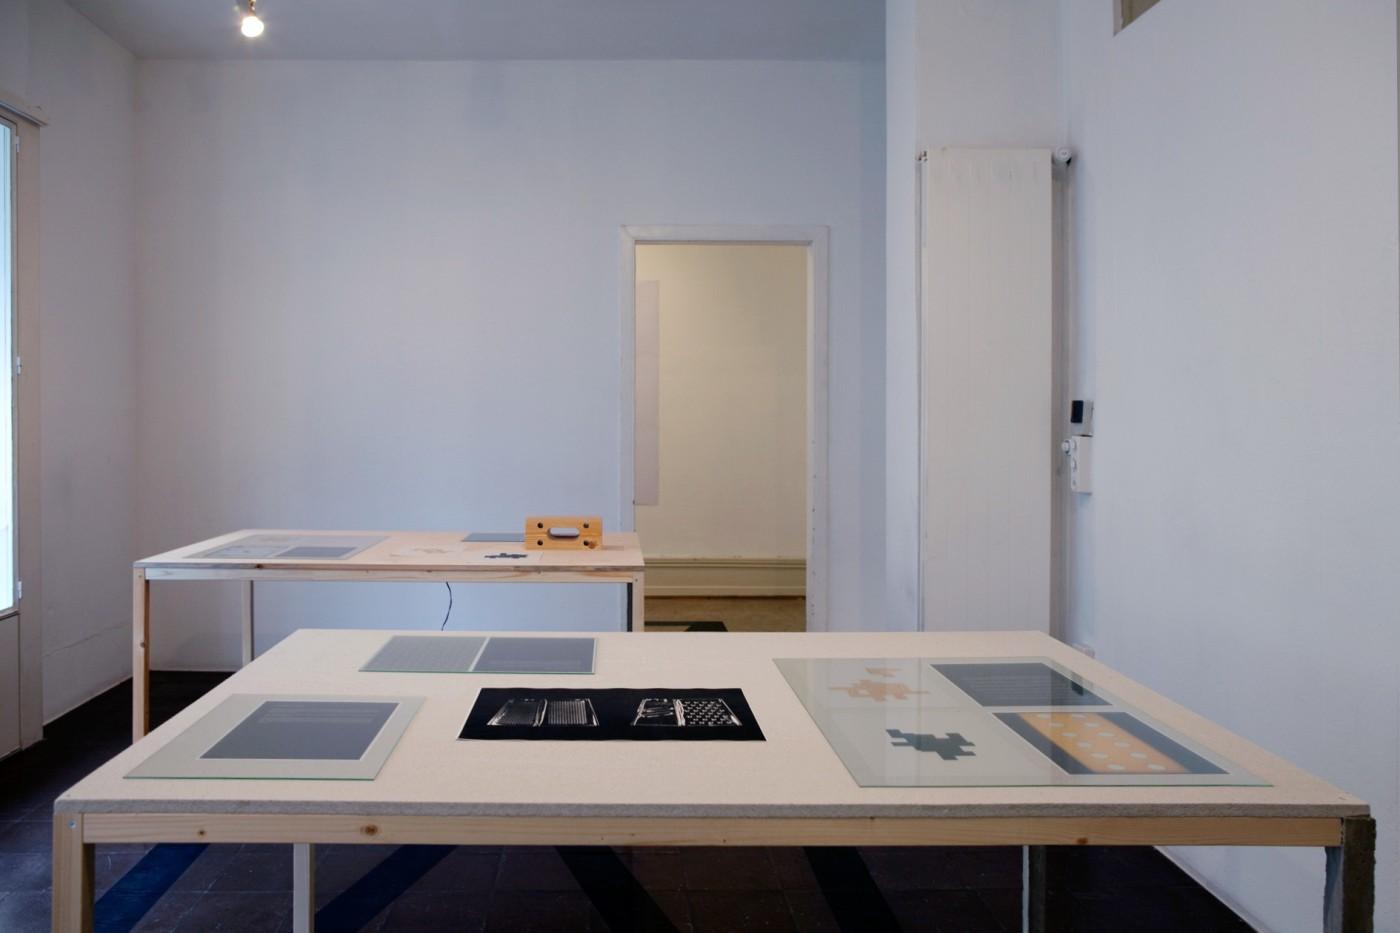 les complices ein m gliches synonym f r anordnen. Black Bedroom Furniture Sets. Home Design Ideas